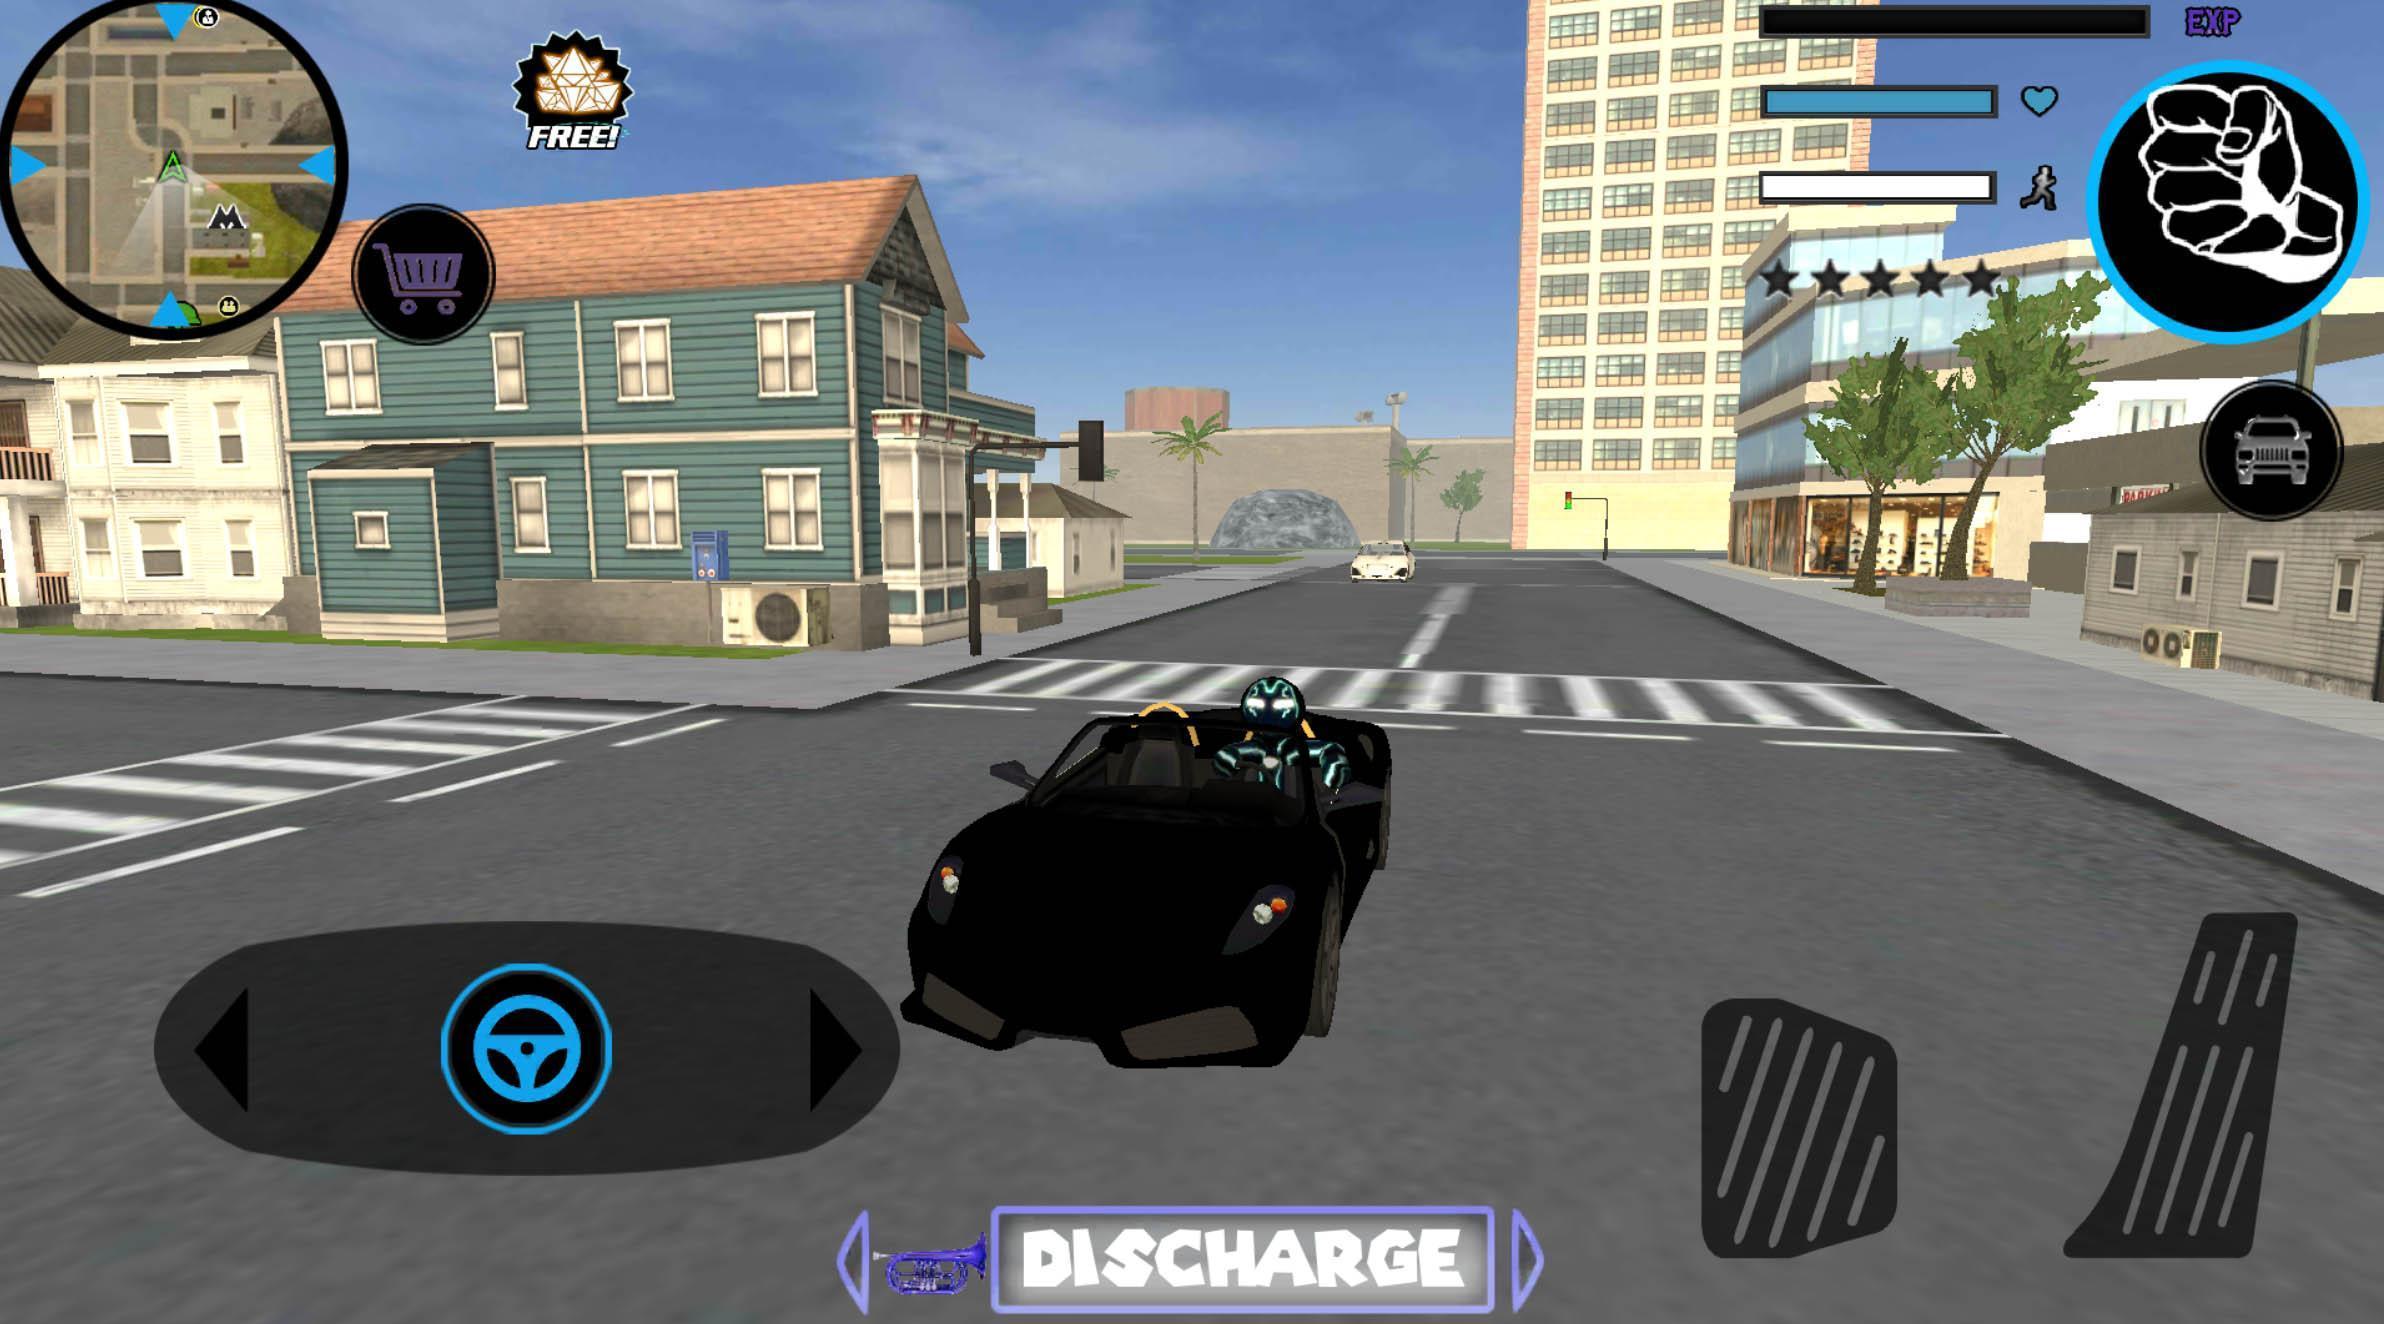 Neon Iron Stickman Rope Hero City Gangstar Mafia 1.6 Screenshot 4